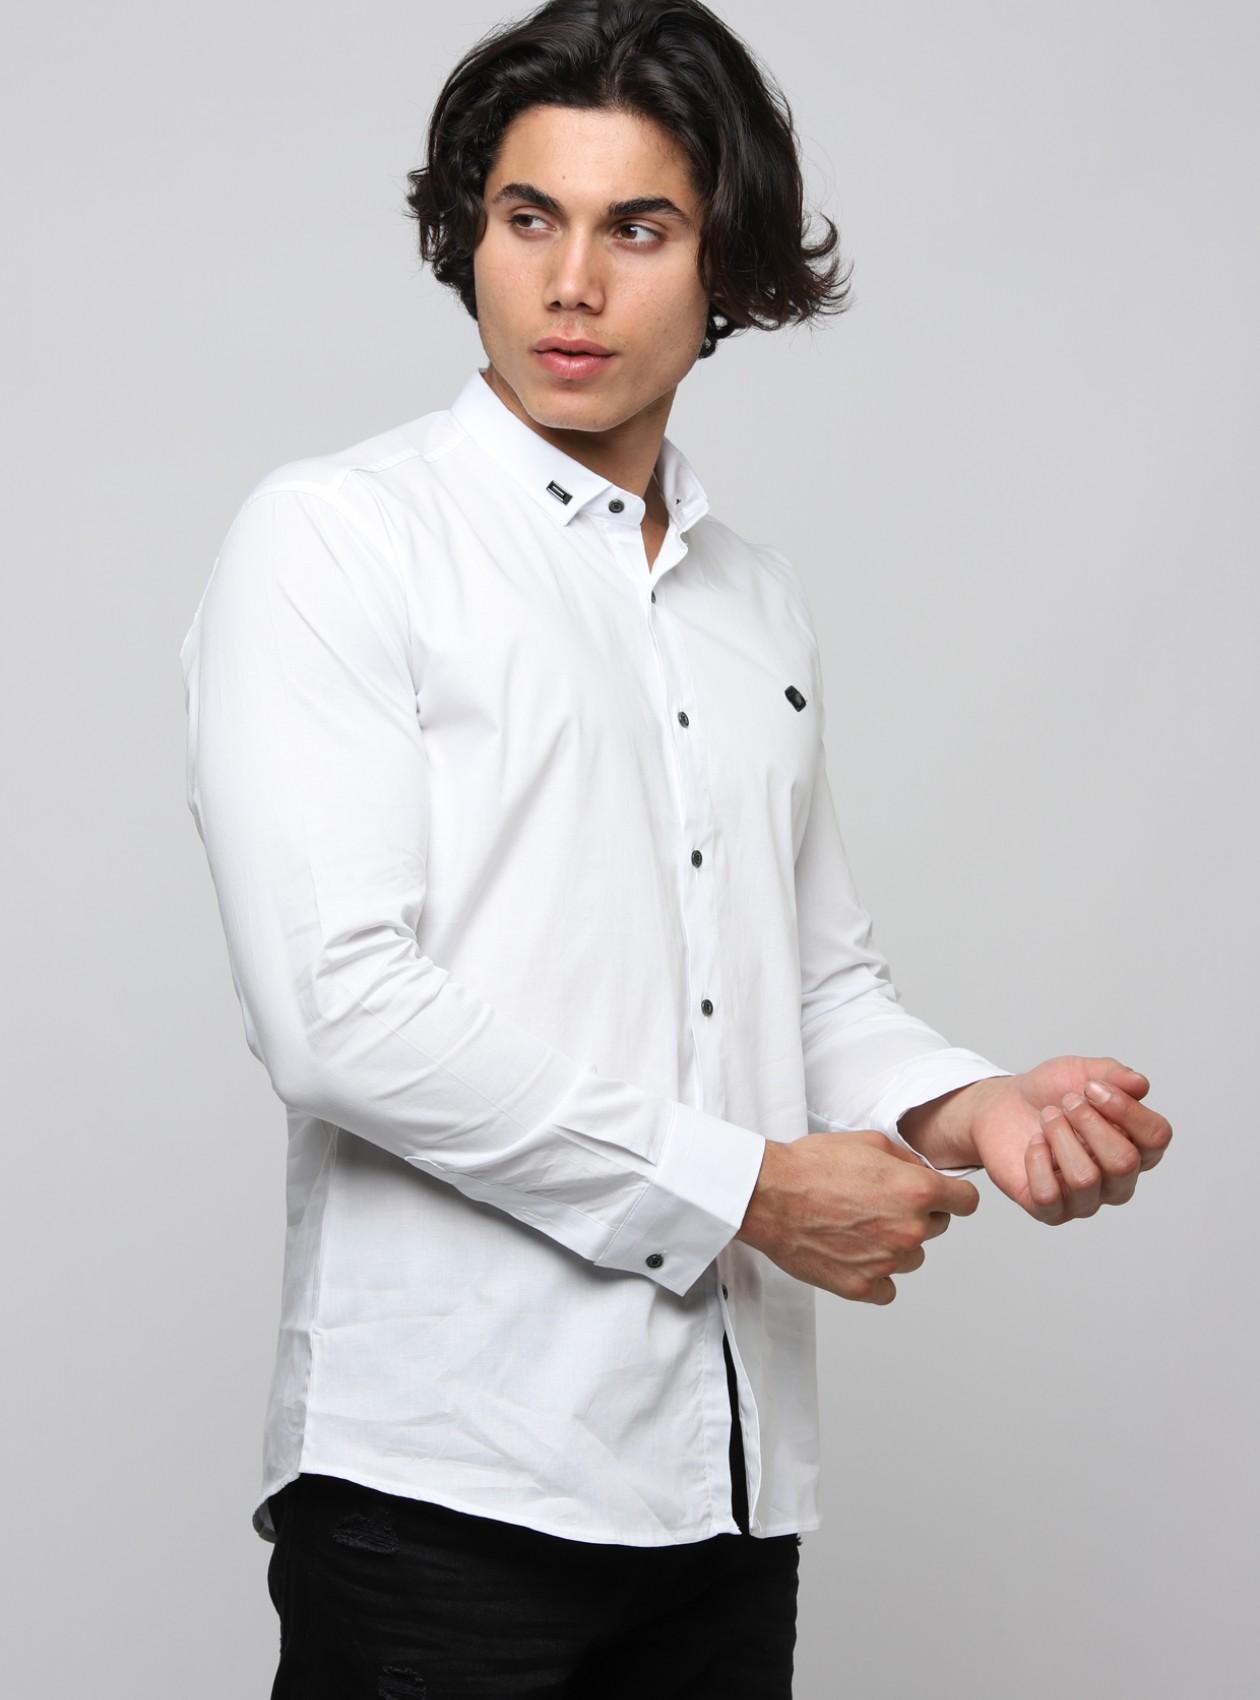 Marque Chemise Homme Blanc